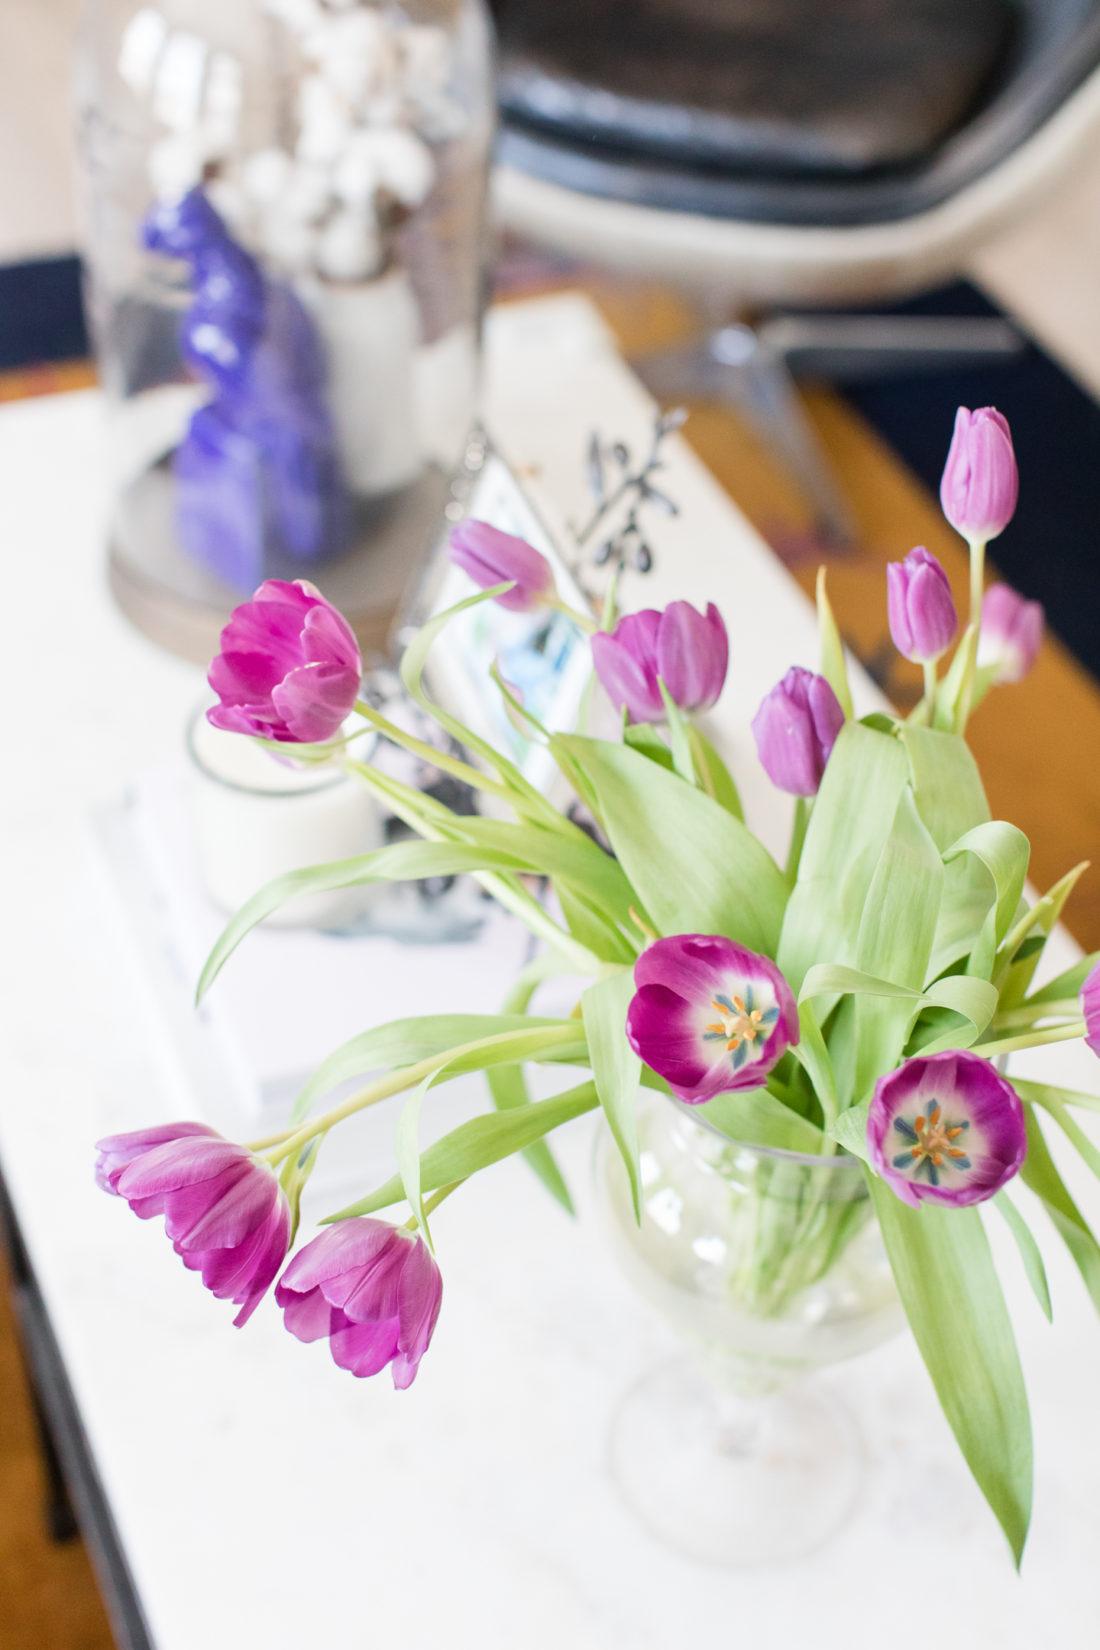 Purple tulips in full bloom on the coffee table of Eva Amurri Martino's Connecticut home